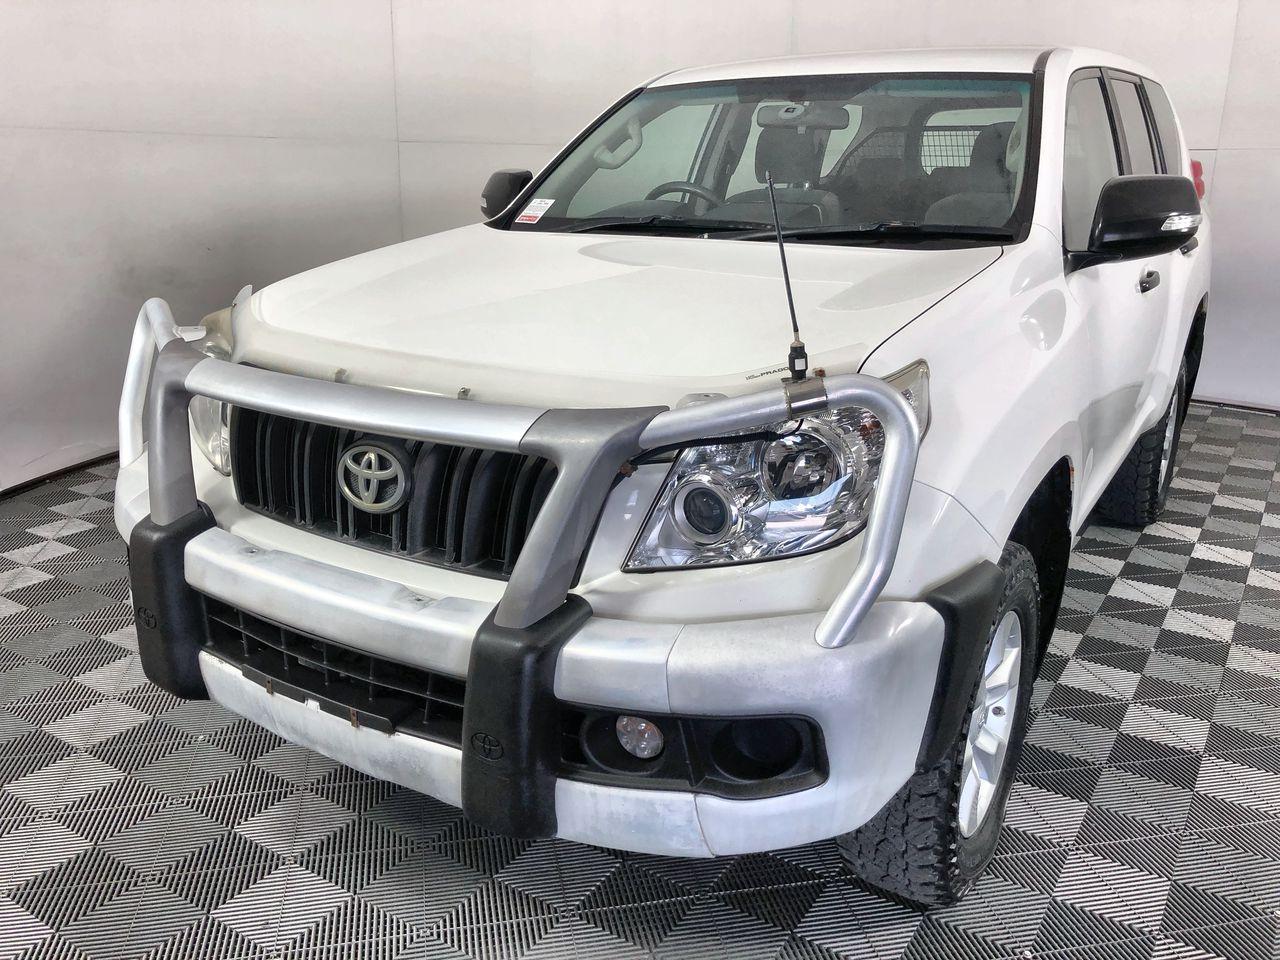 2011 (2012) Toyota Landcruiser Prado GX (4x4) Turbo Diesel Wagon 148,926km